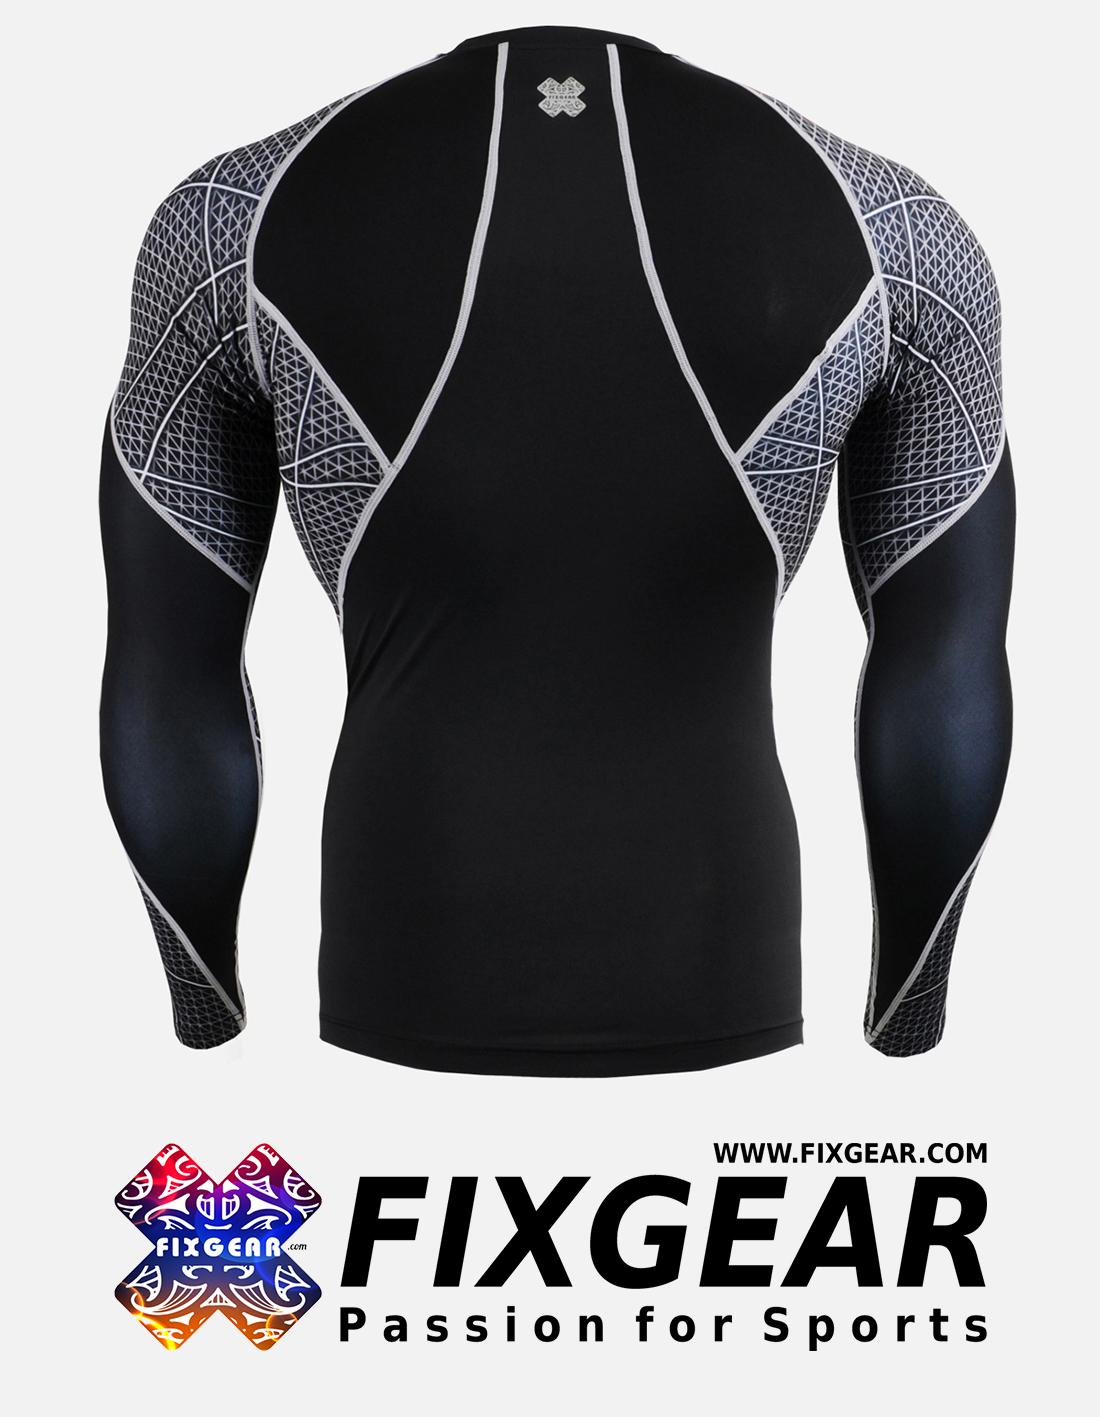 FIXGEAR C3L-B70 Compression Base Layer Shirt